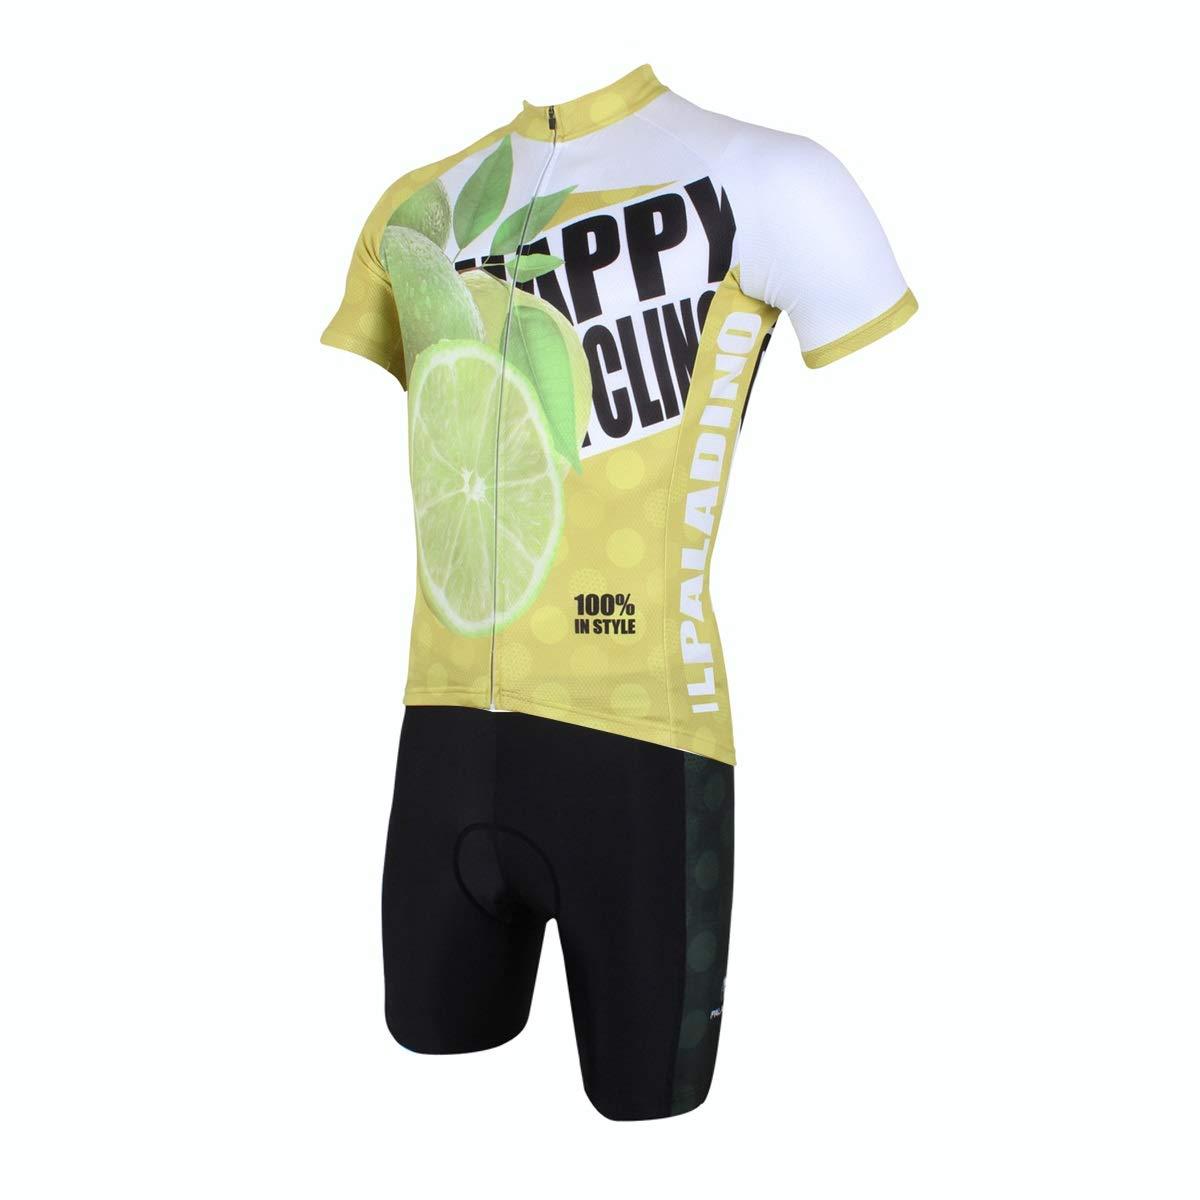 Jersey Bike Outdoor Sports Jersey Herren Mountainbike Jersey Anzüge Frühling Sommer Fahrrad Reitanzug Fahrradtrikot LPLHJD